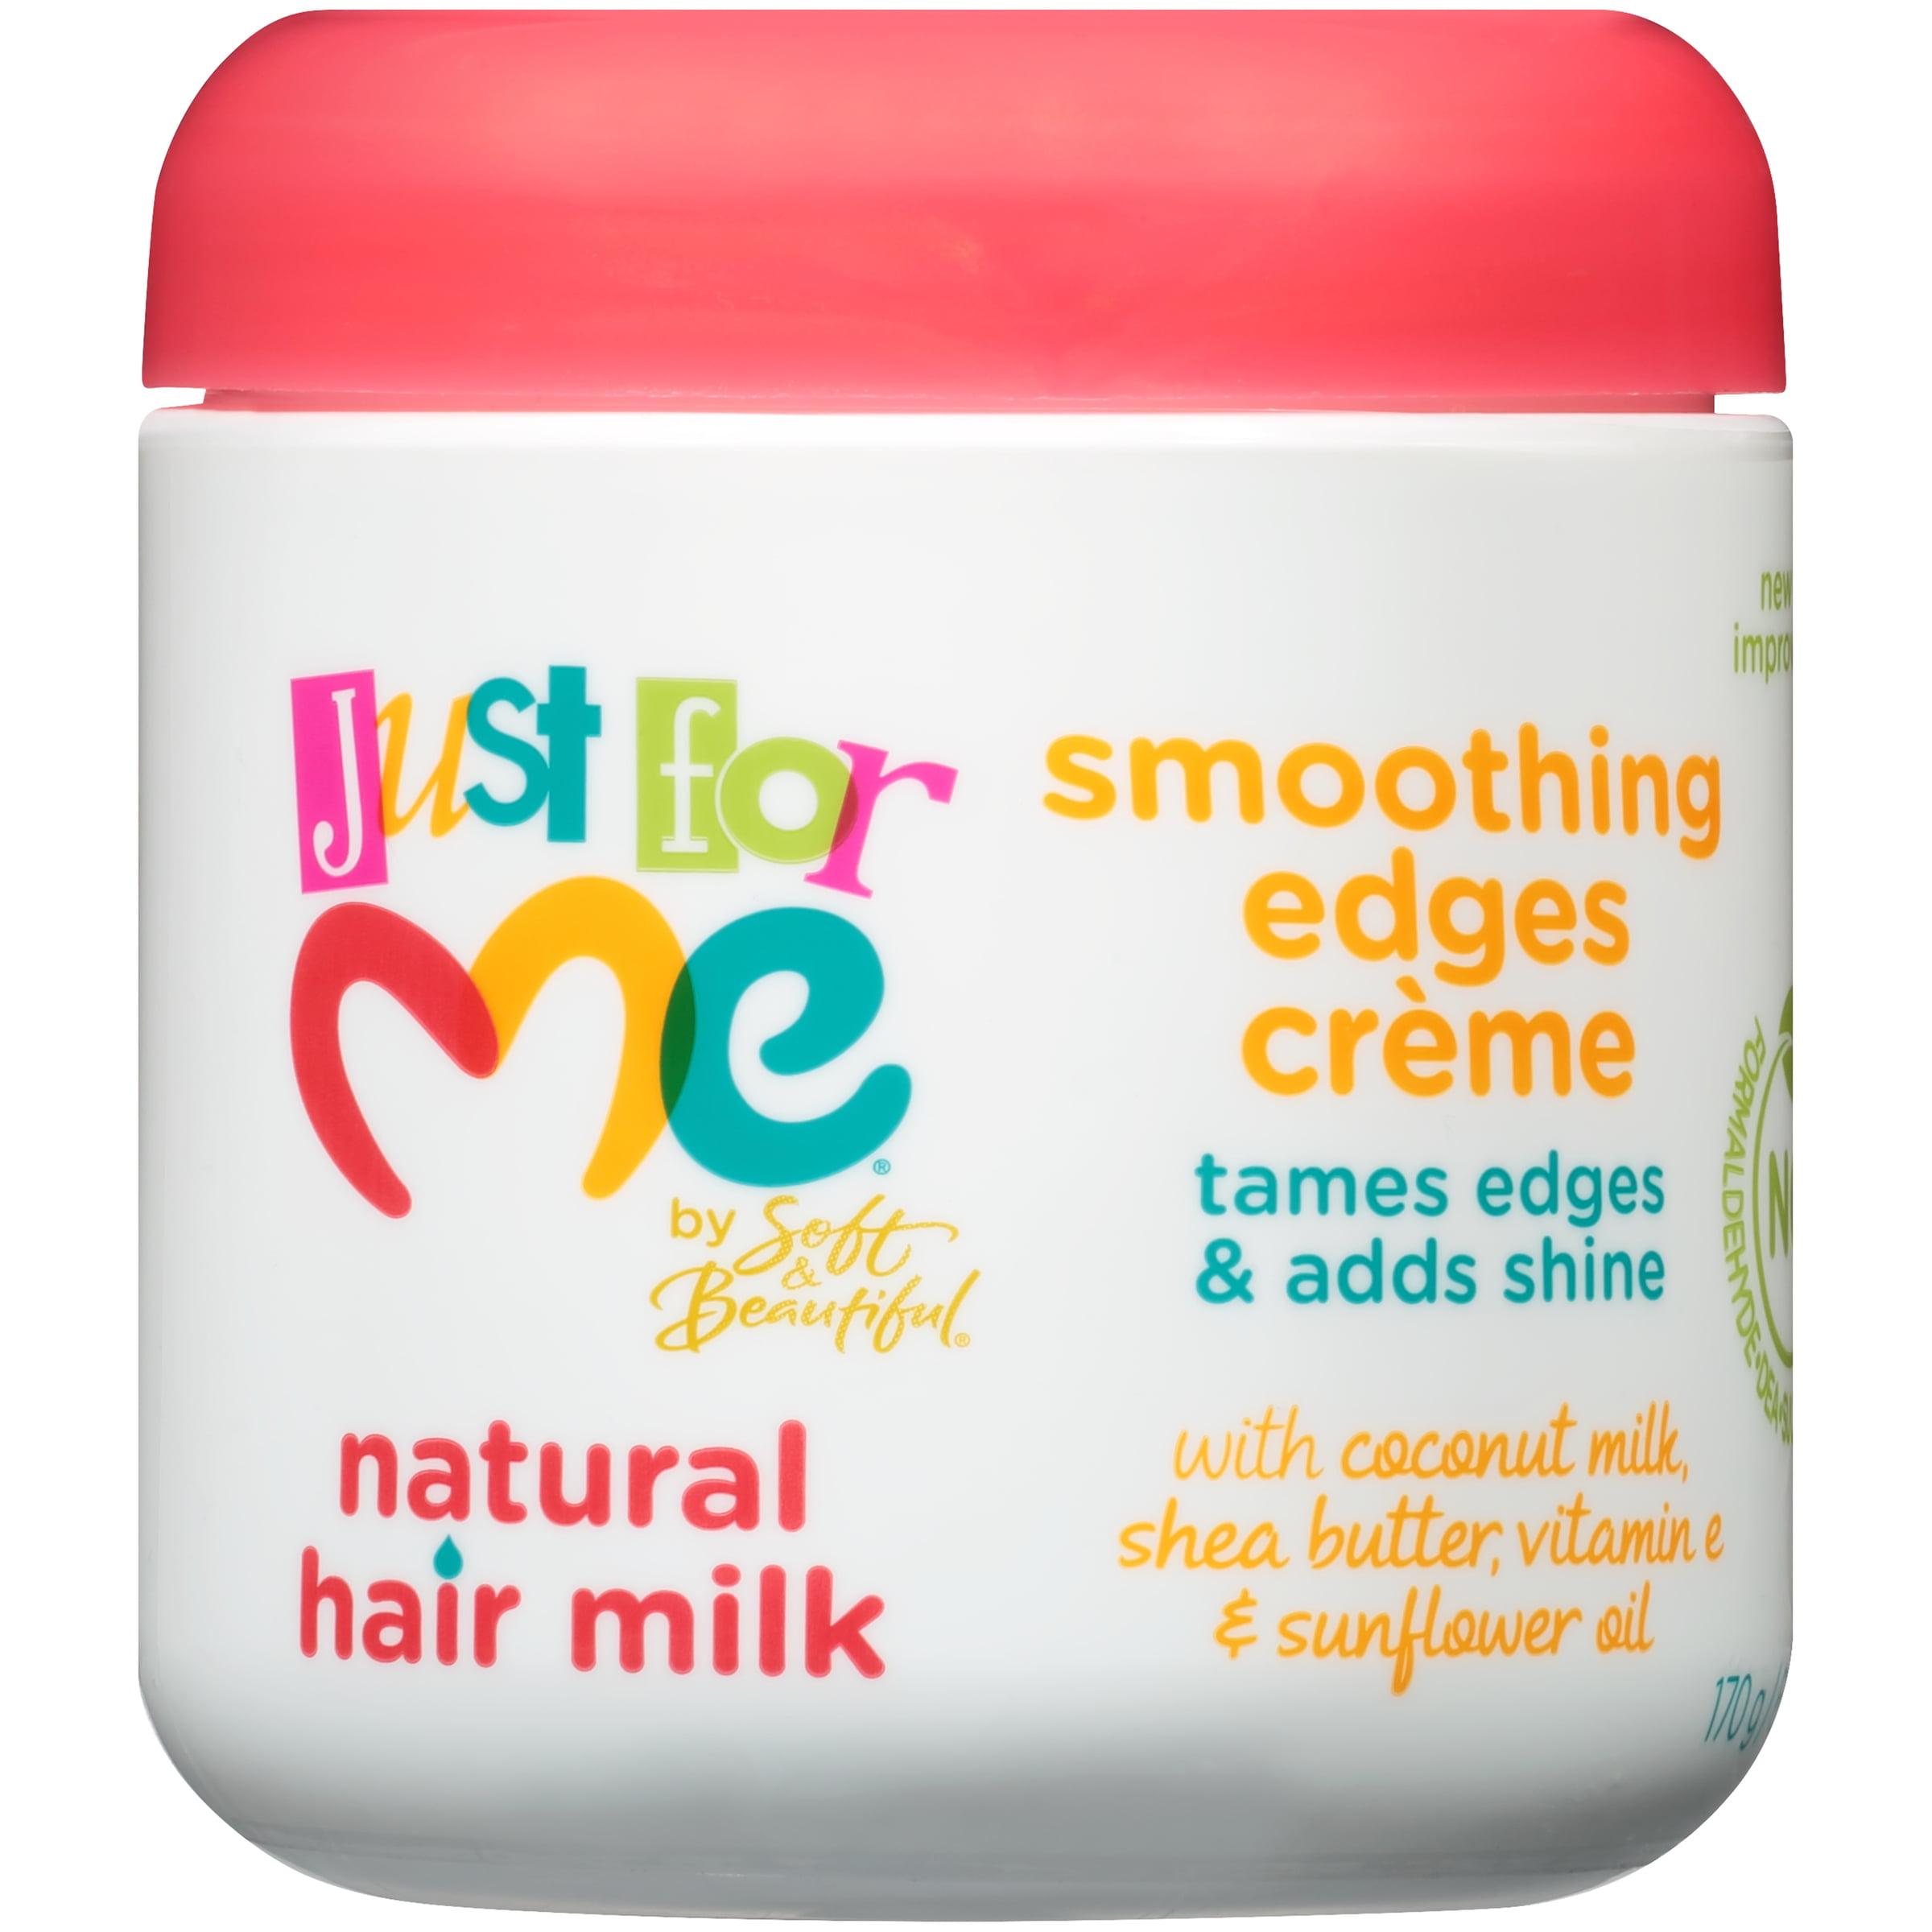 Just For Me® Natural Hair Milk Smoothing Edges Hair Creme 6 oz. Jar